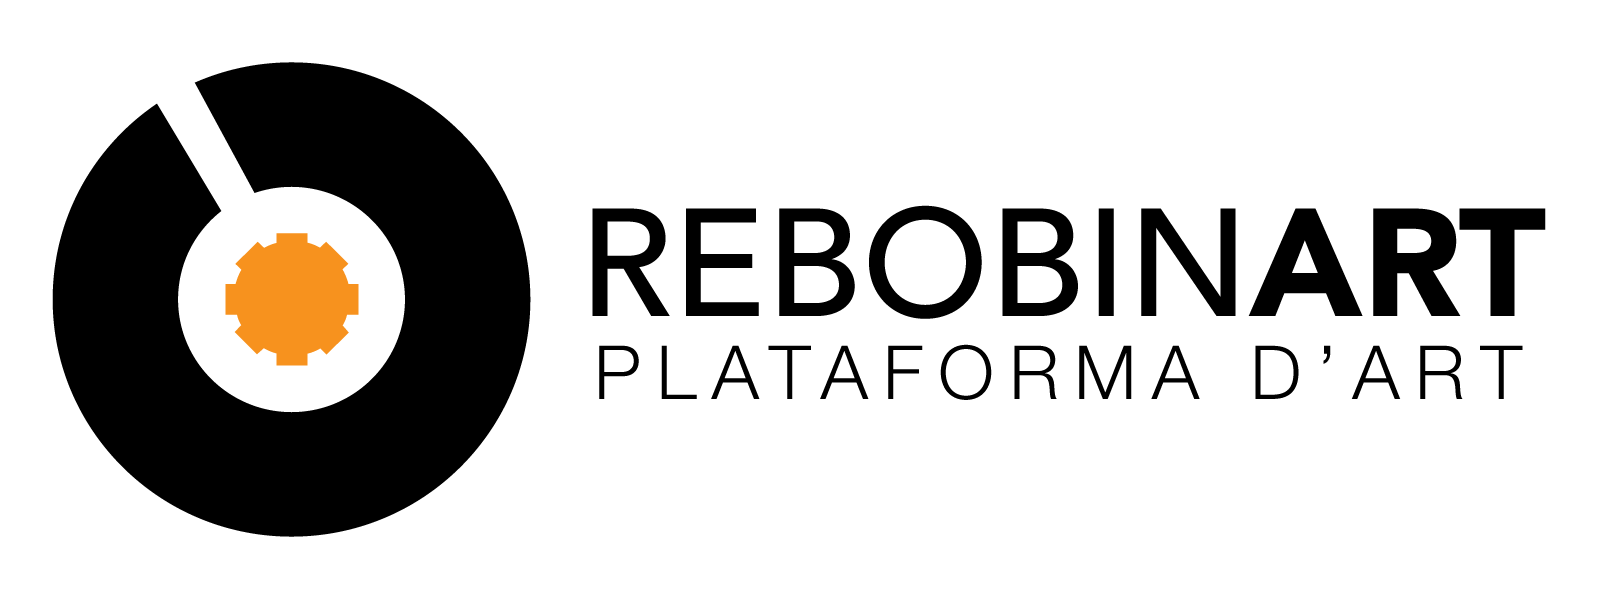 REBOBINART: PLATAFORMA D'ART